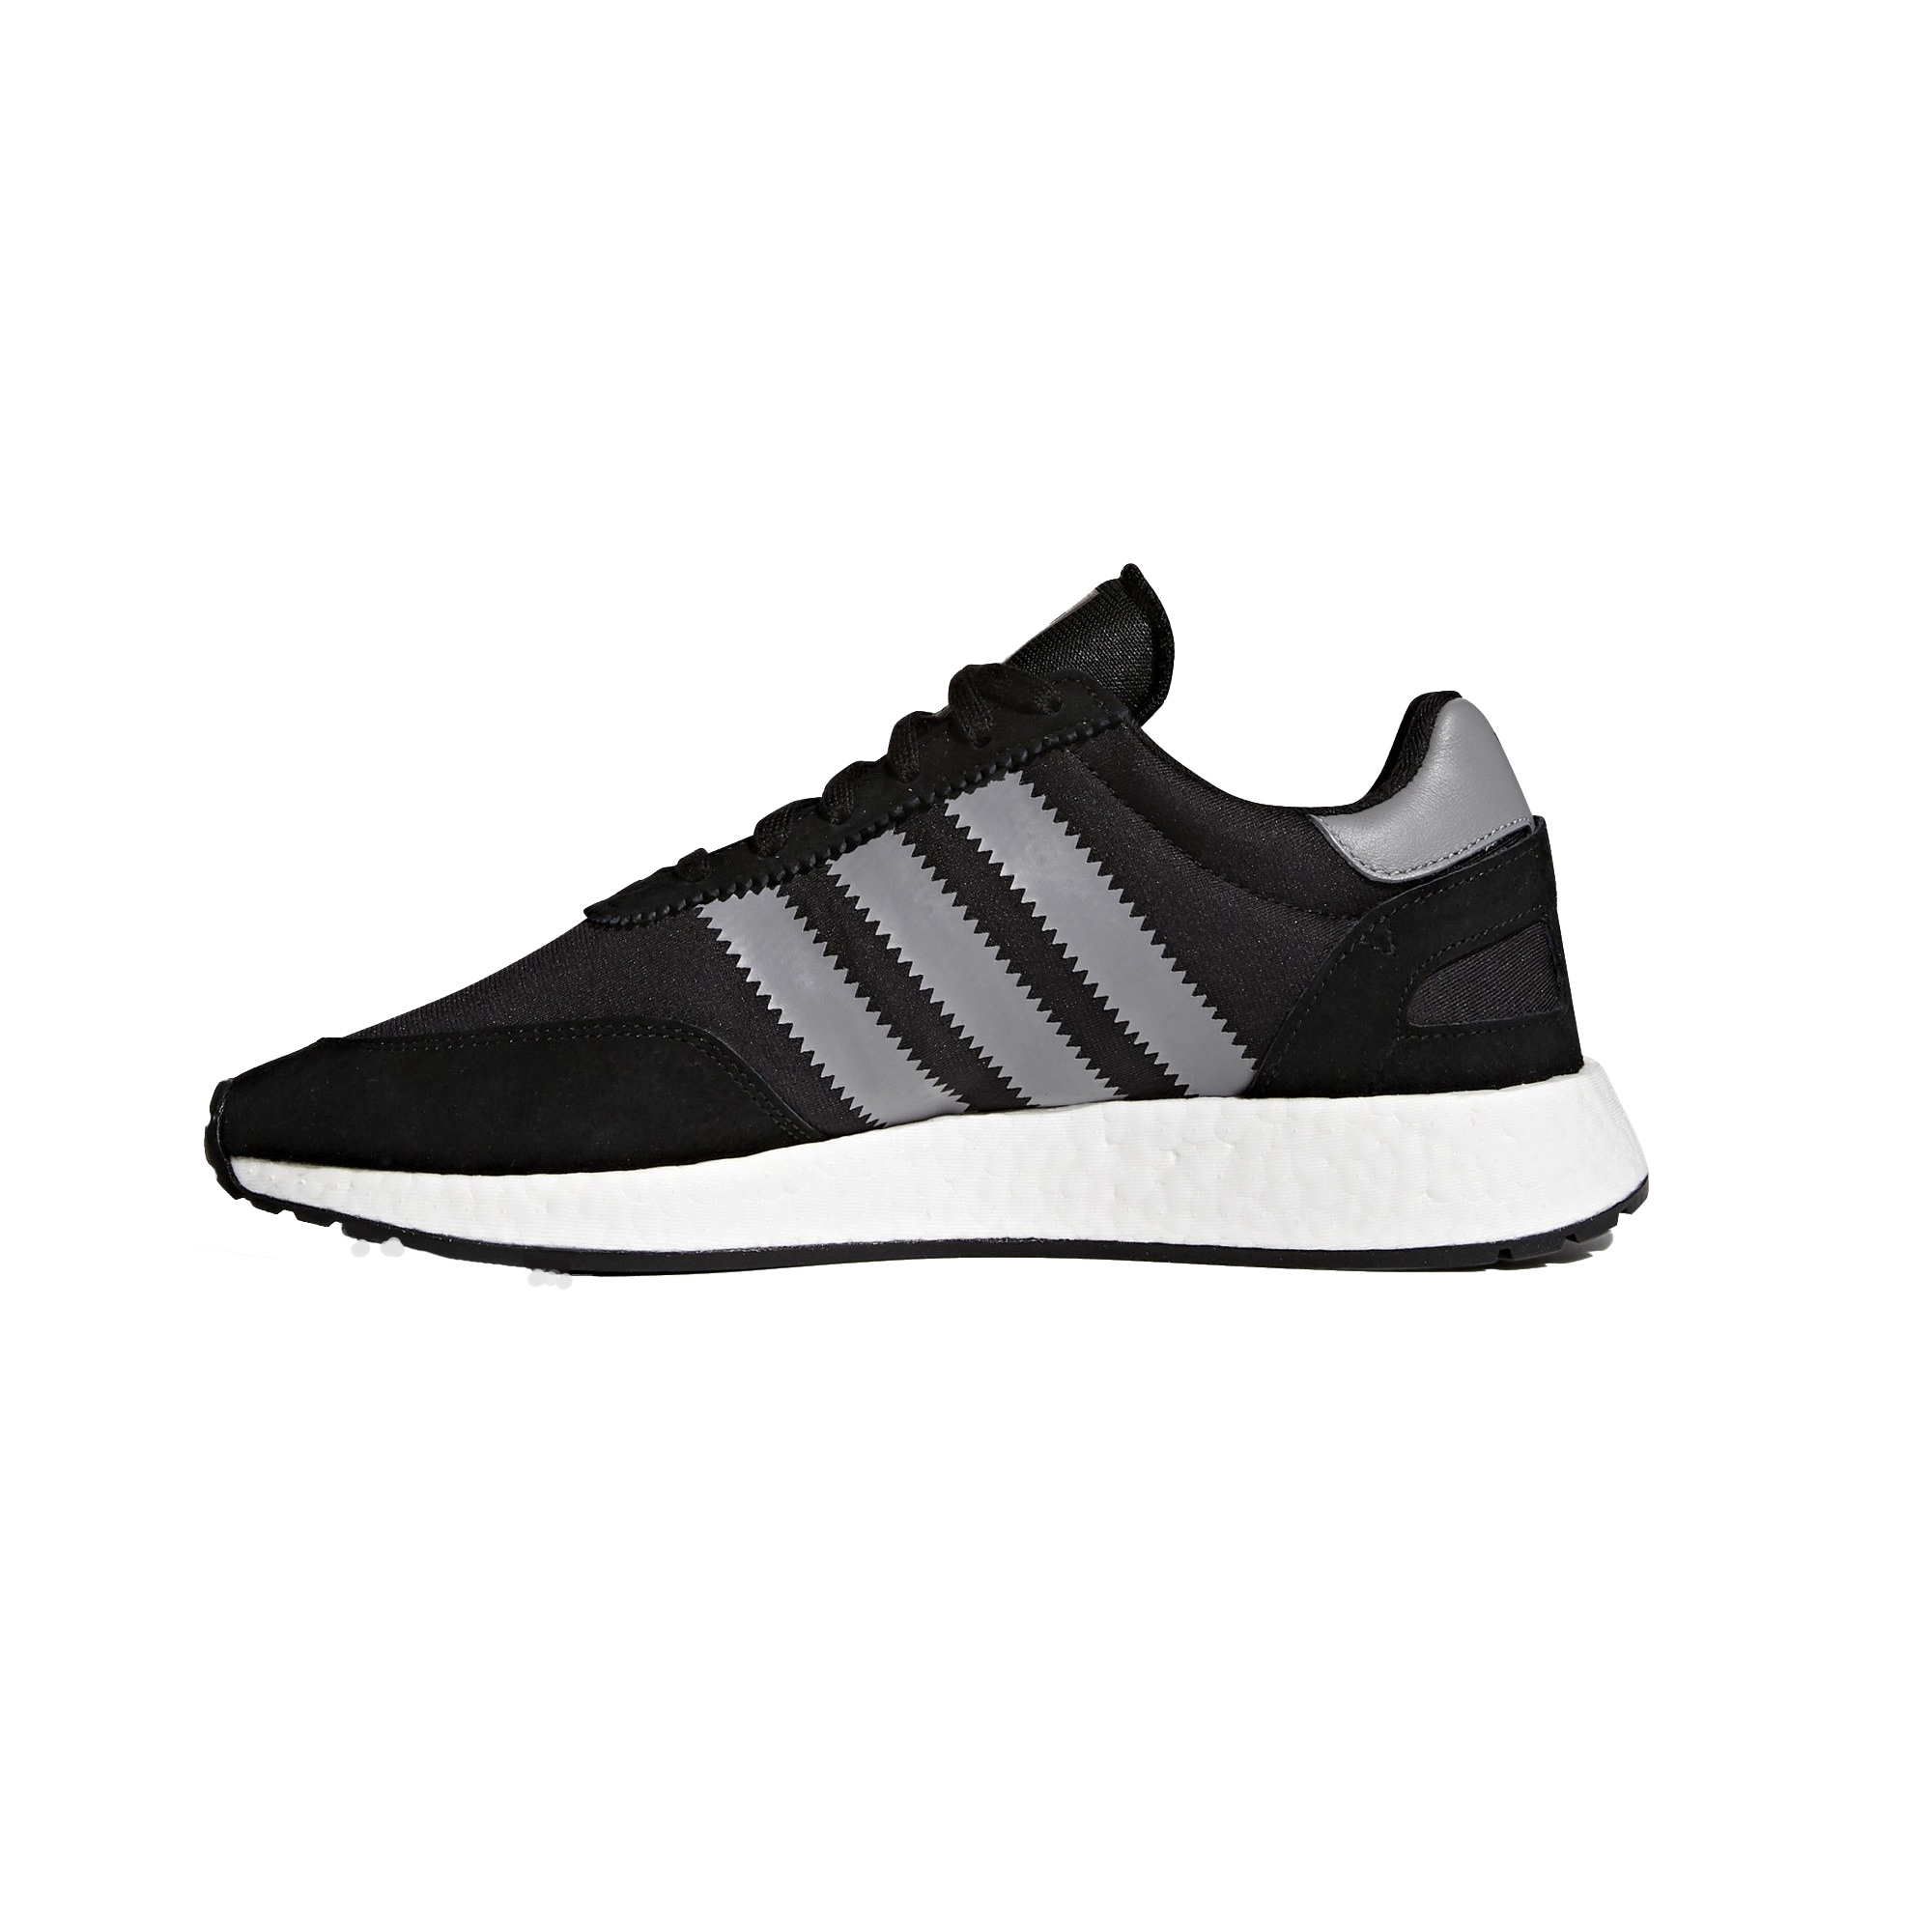 dfd9a7a70600ac ... Vorschau  adidas Originals I5923 Unisex Herren Damen Schuhe Sneaker  Sportschuhe Laufschuhe